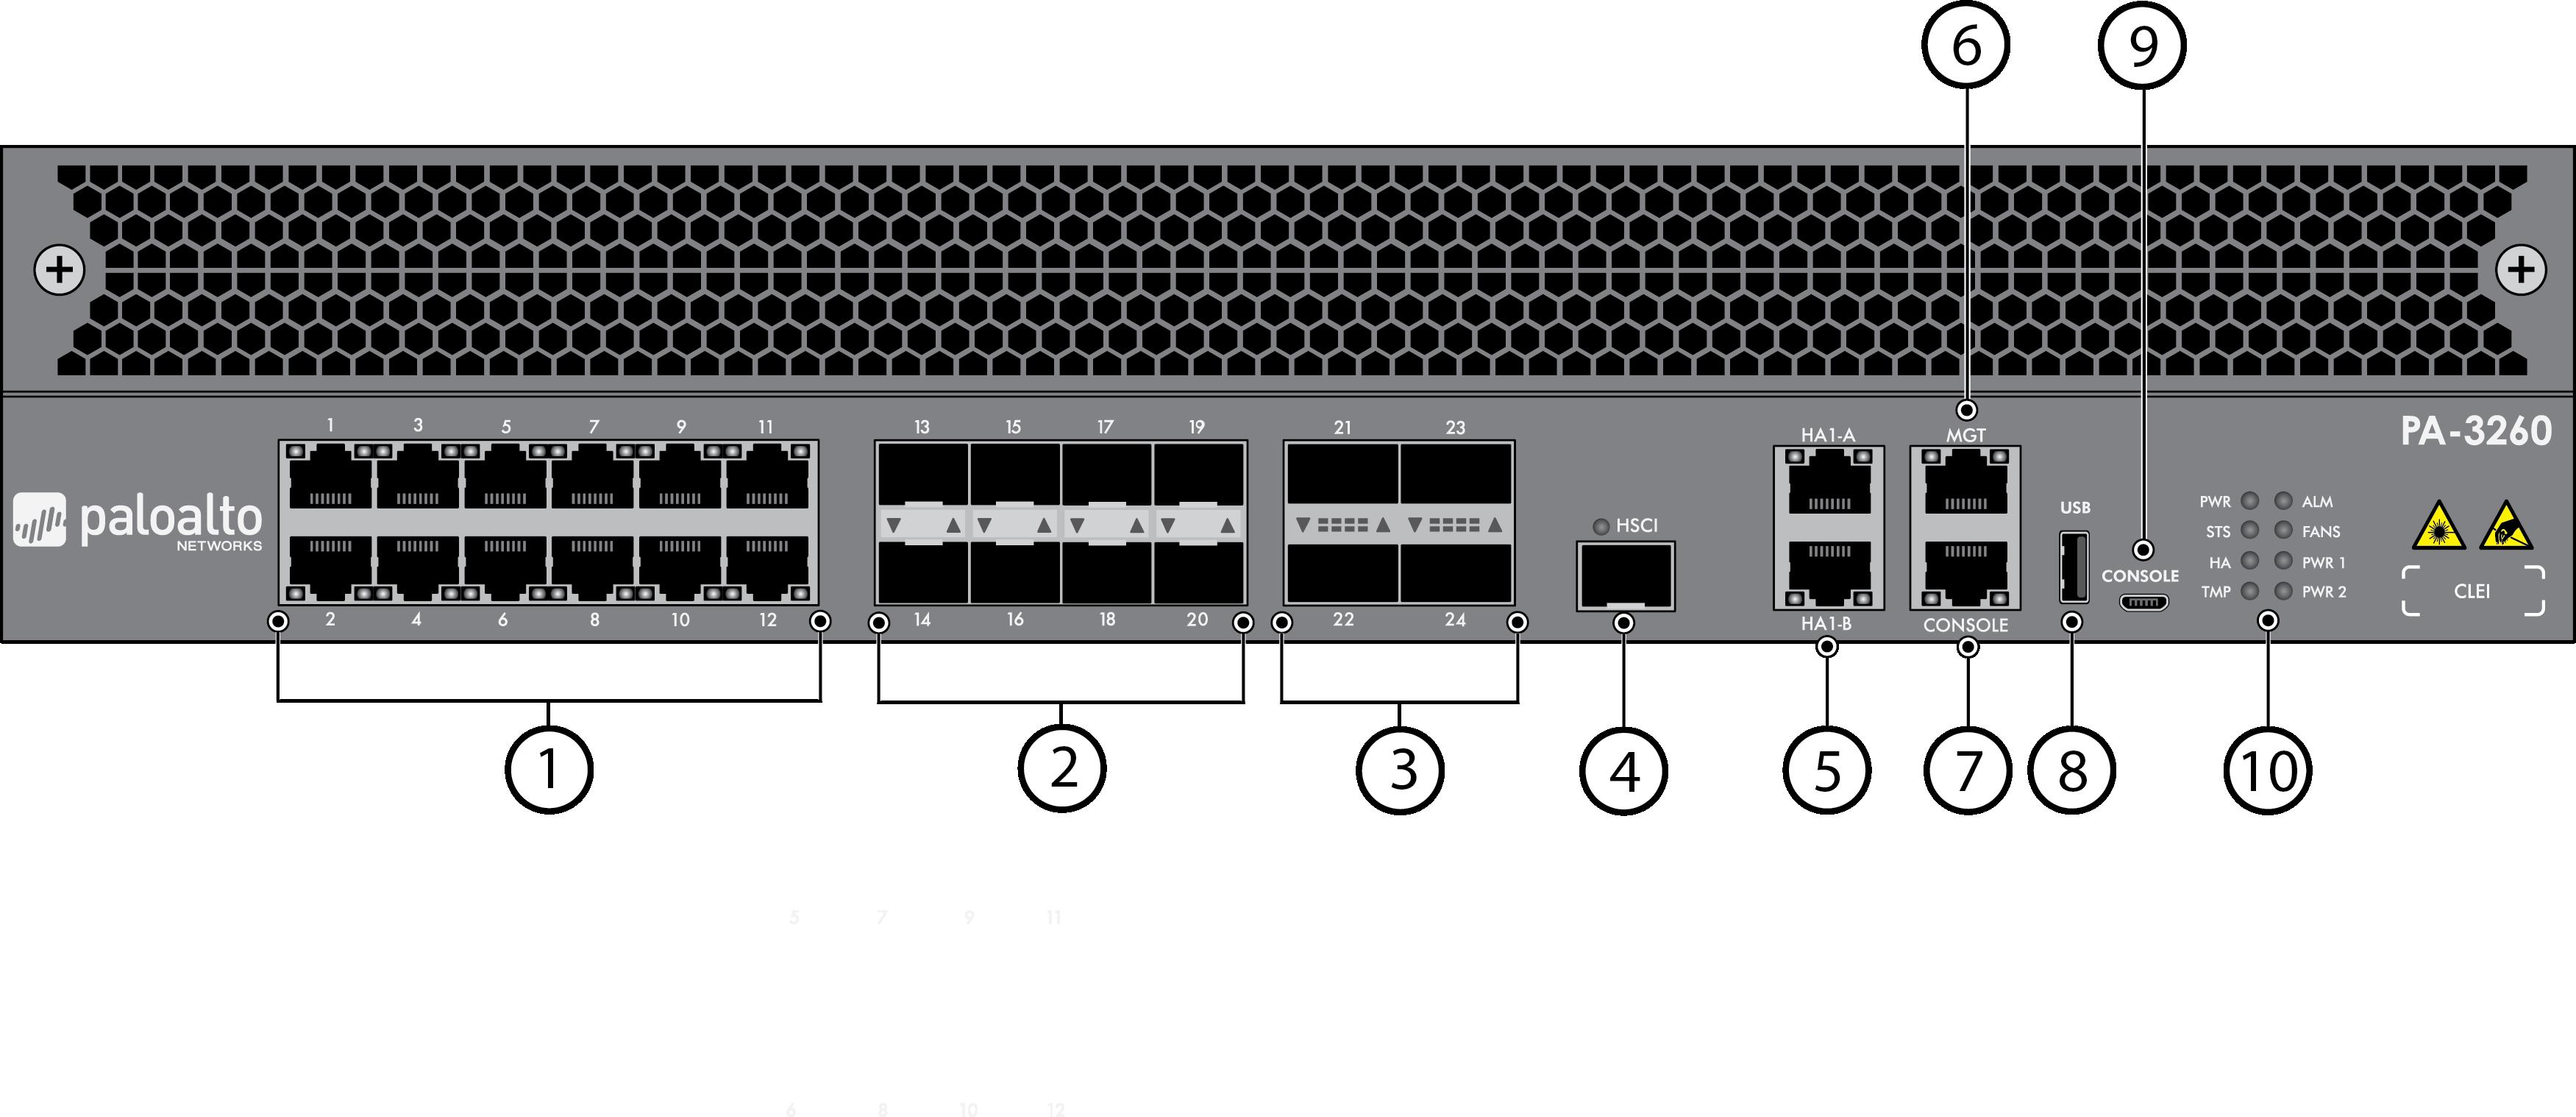 Palo Alto Networks Enterprise Firewall PA-3260 | PaloGuard com